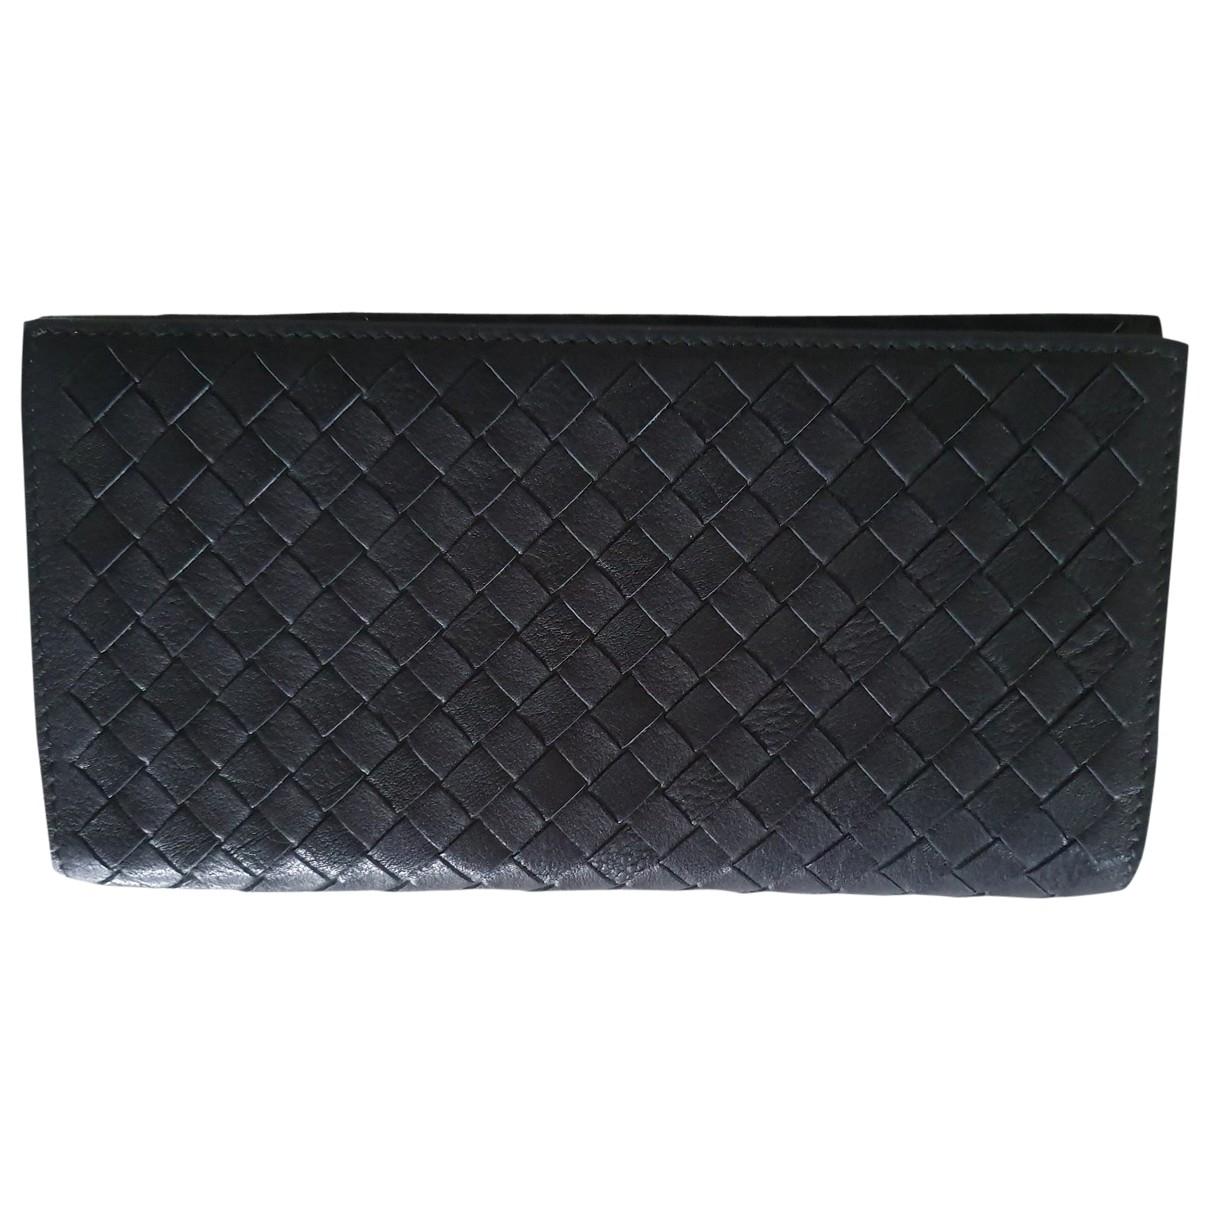 Bottega Veneta Intrecciato Black Leather wallet for Women \N